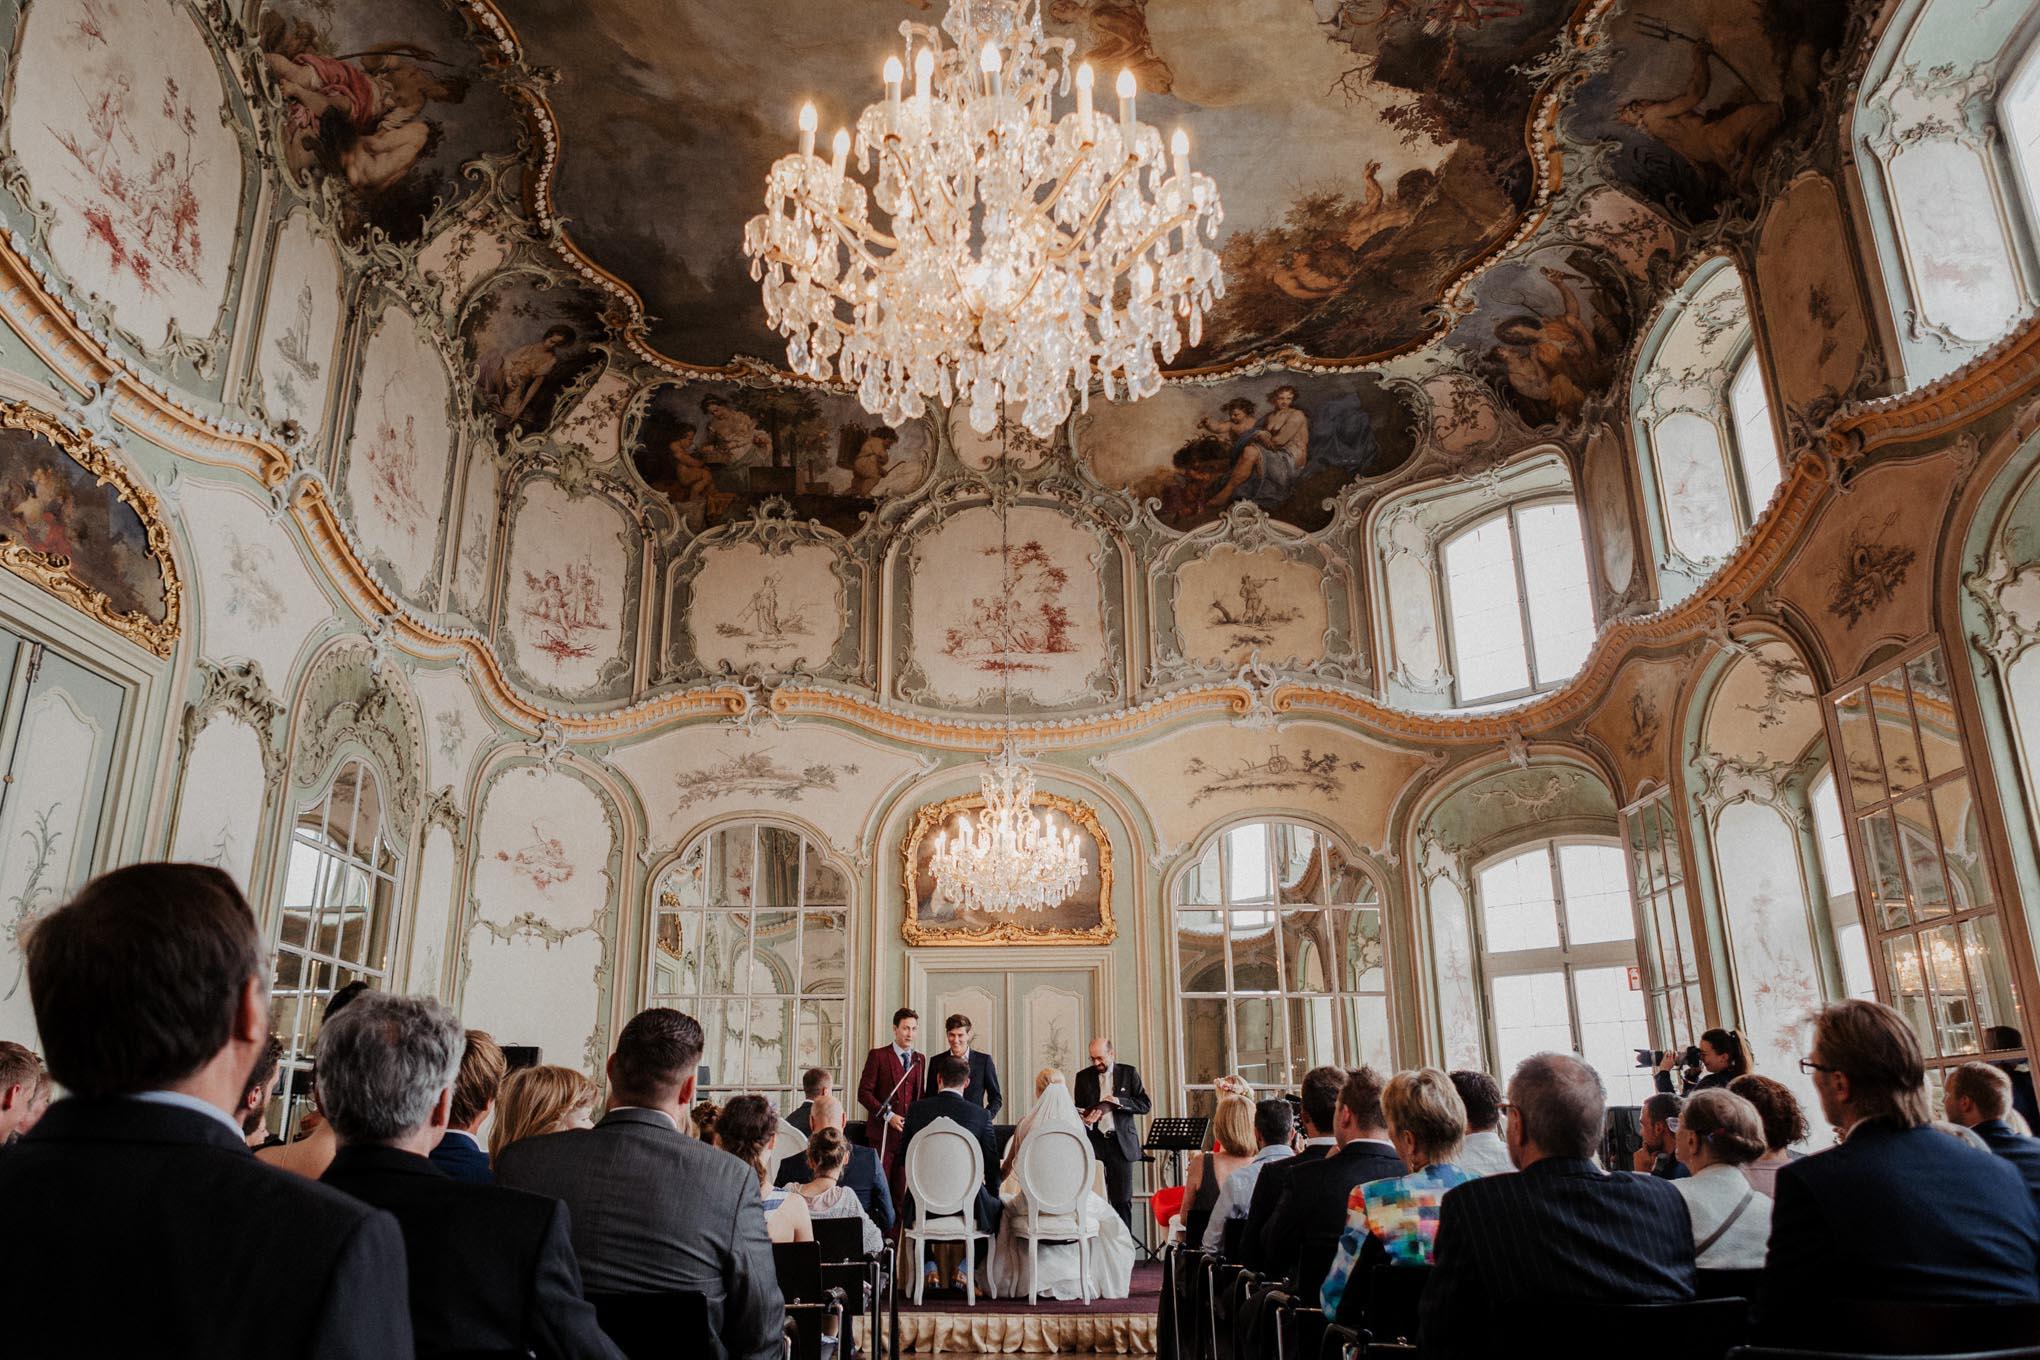 Hochzeitsgesellschaft auf Schloss Engers